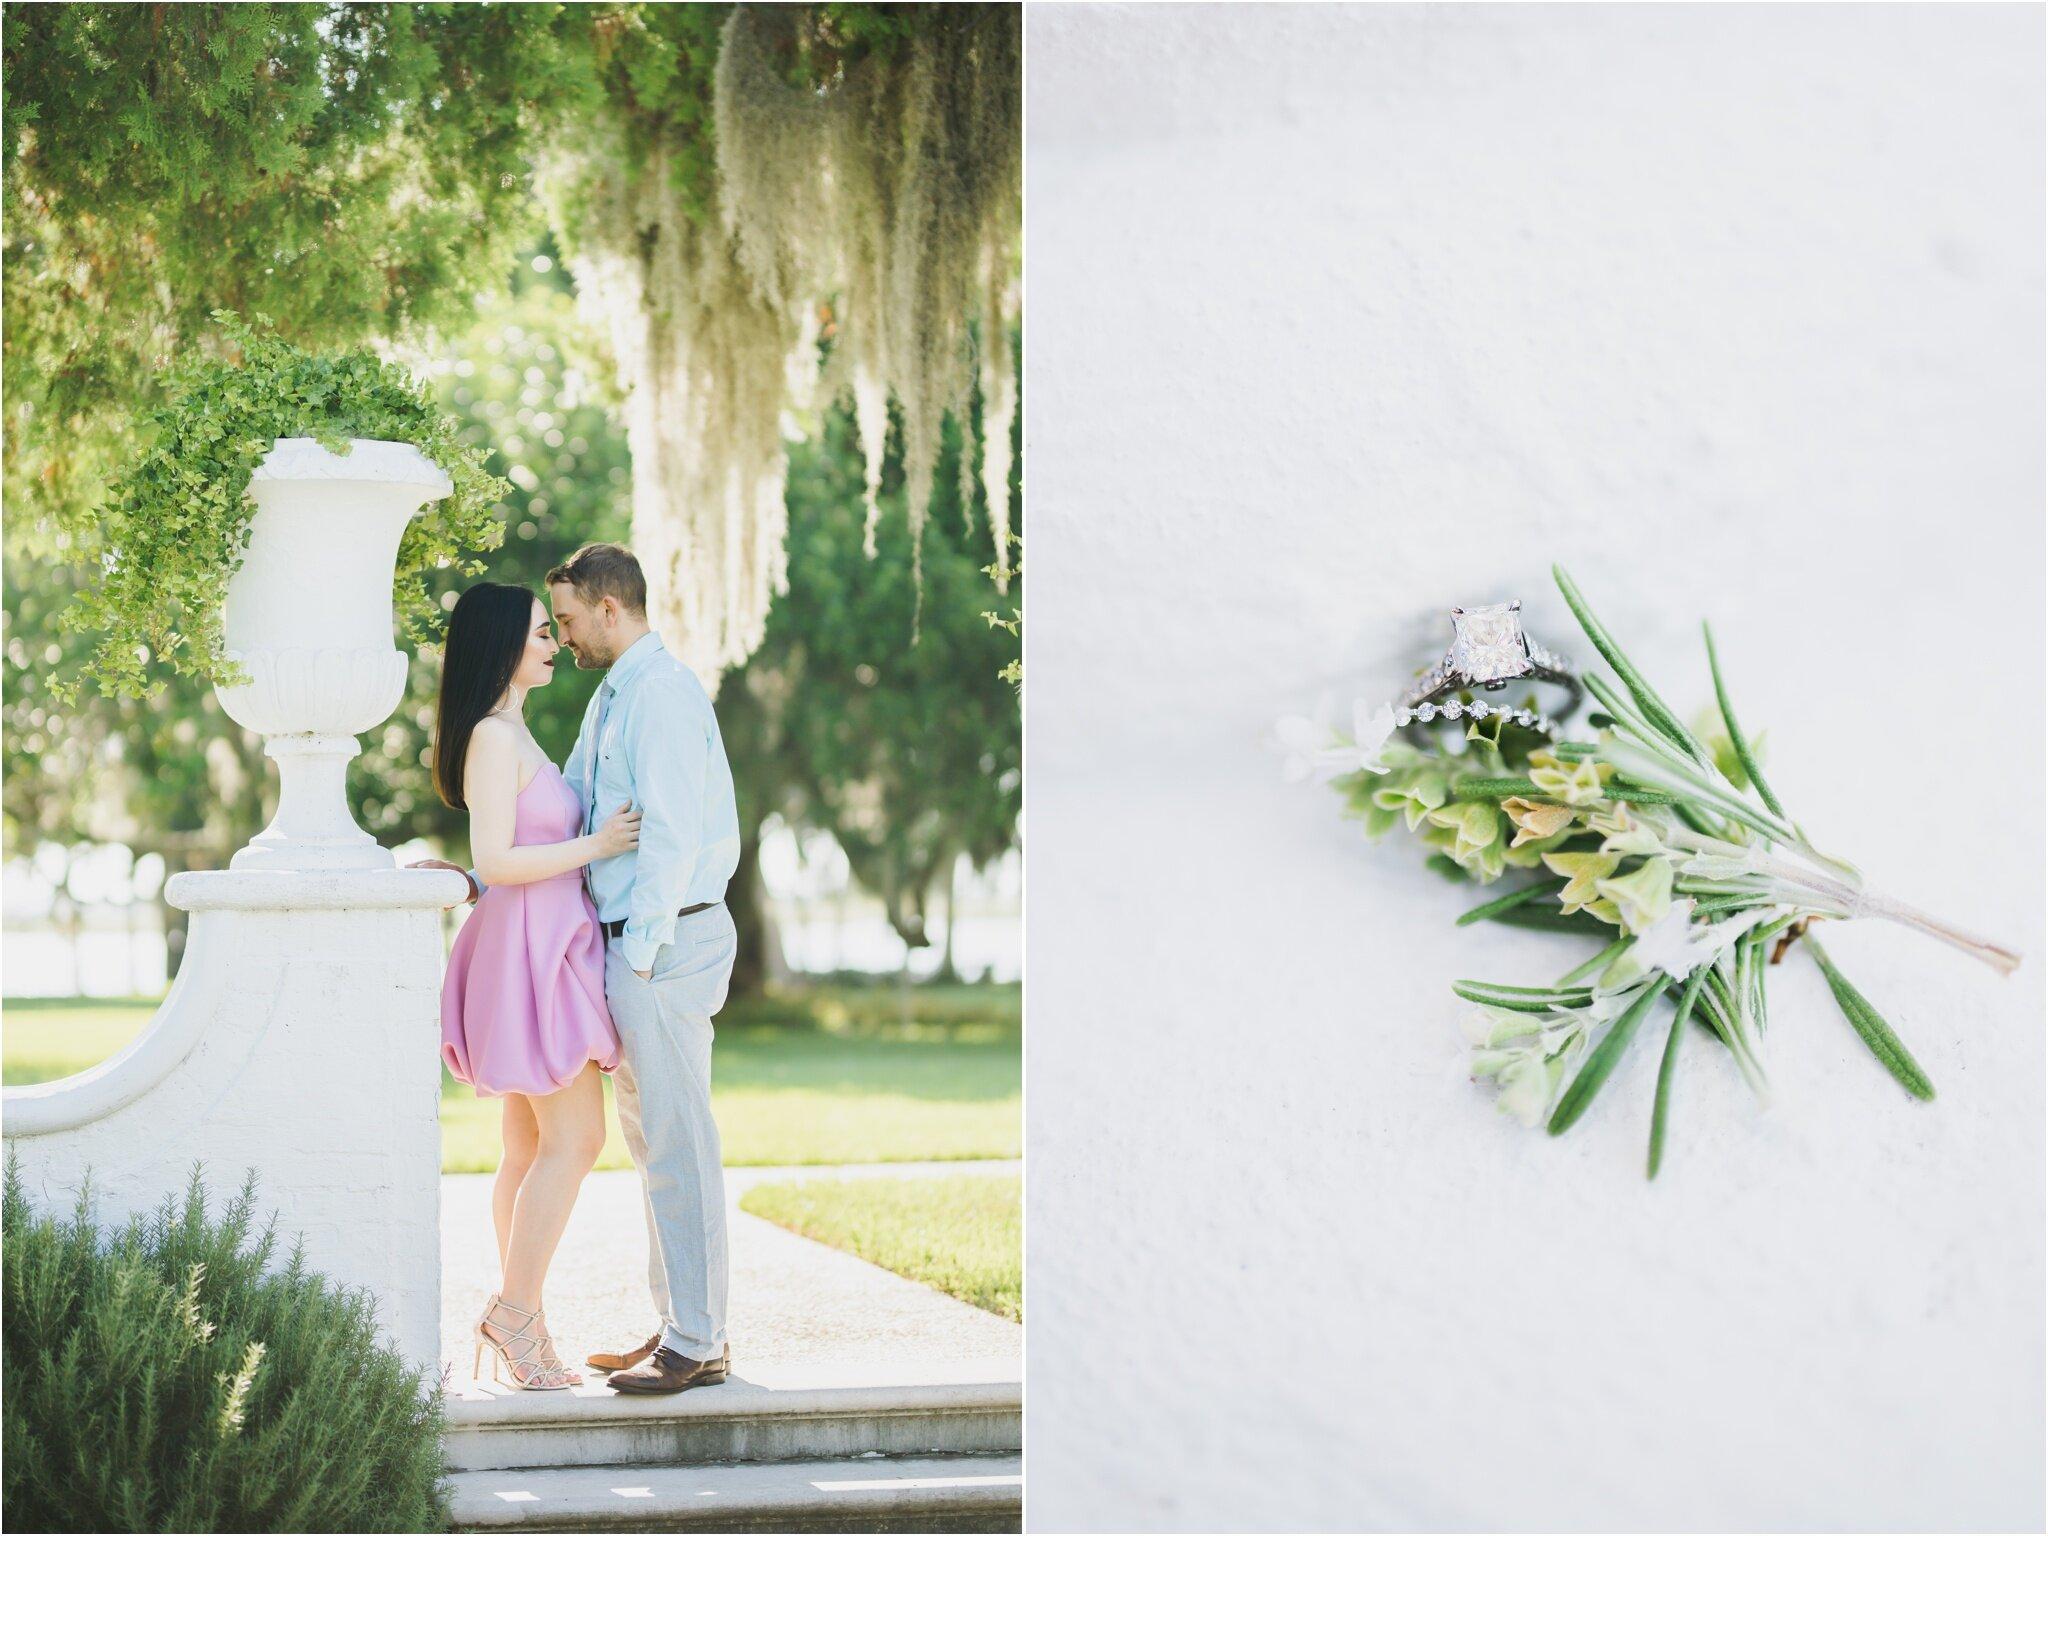 Rainey_Gregg_Photography_St._Simons_Island_Georgia_California_Wedding_Portrait_Photography_1824.jpg